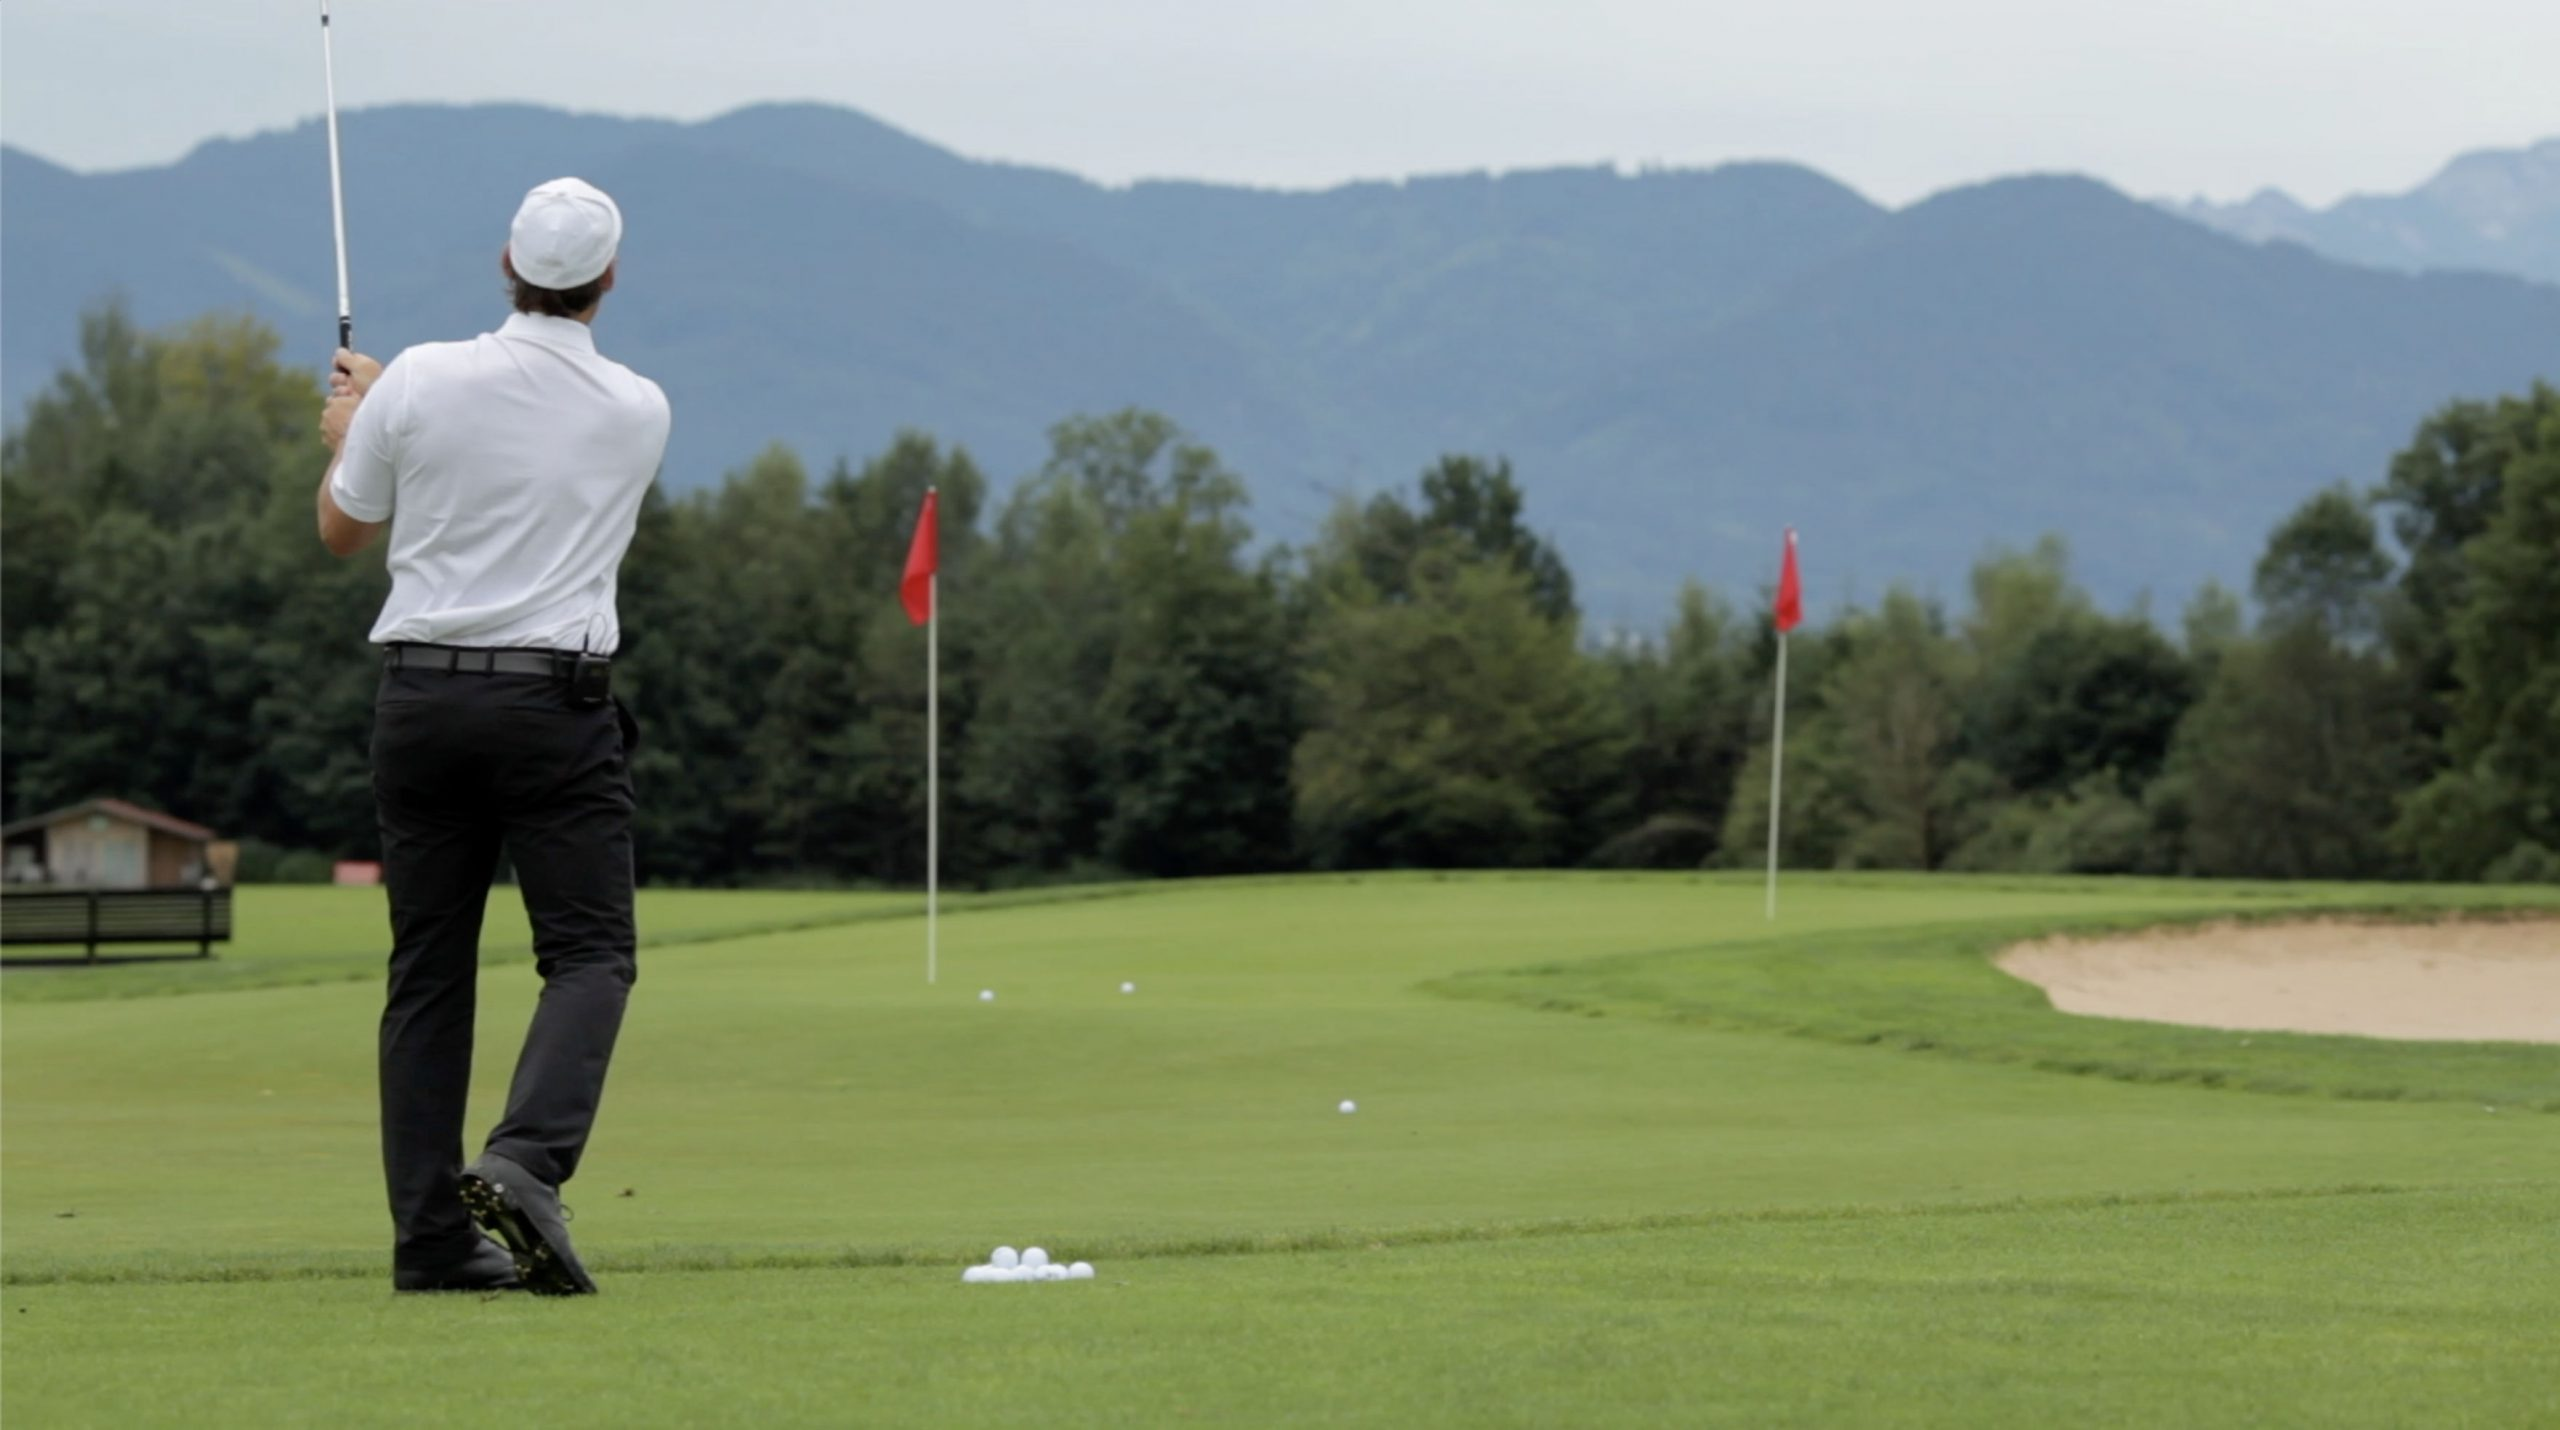 Golf - Übungsgrün mit Fahnen - Christian Neumaier im Golfclub Beuerberg